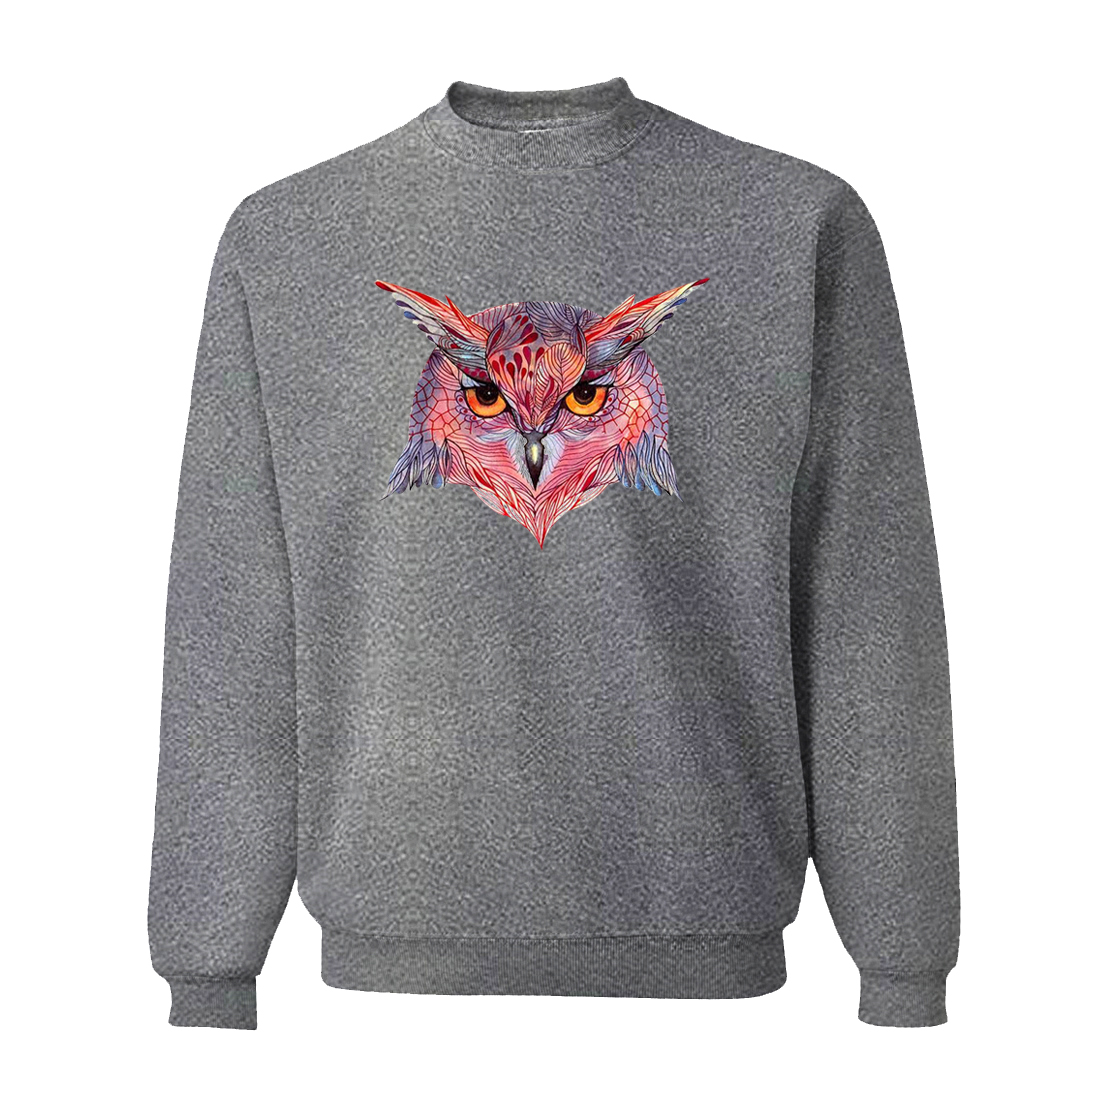 Animal Red Owl Mens Sweatshirt Hoodie 2019 Spring Harajuku Sweatshirts Men Fleece Dark Gray Hoody For Male Brand Clothing CM01